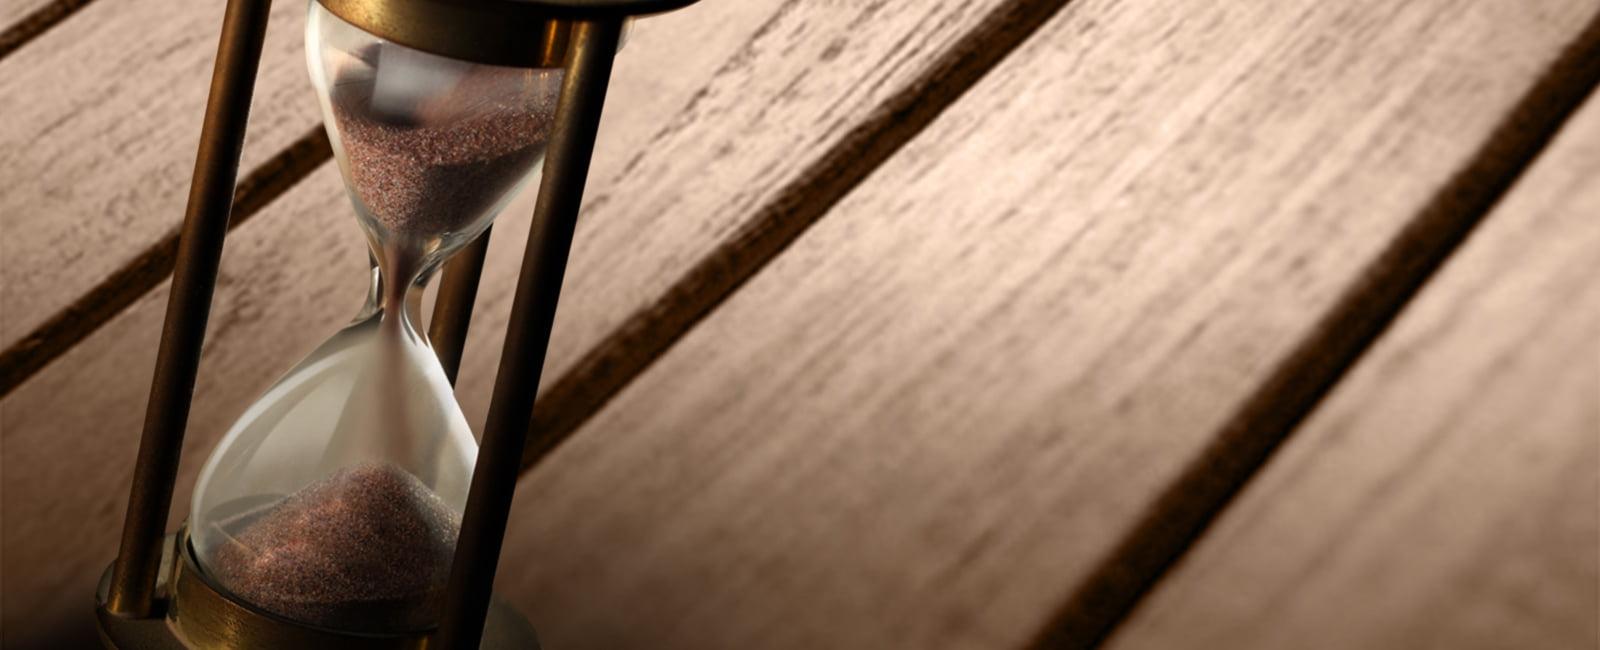 history plywood